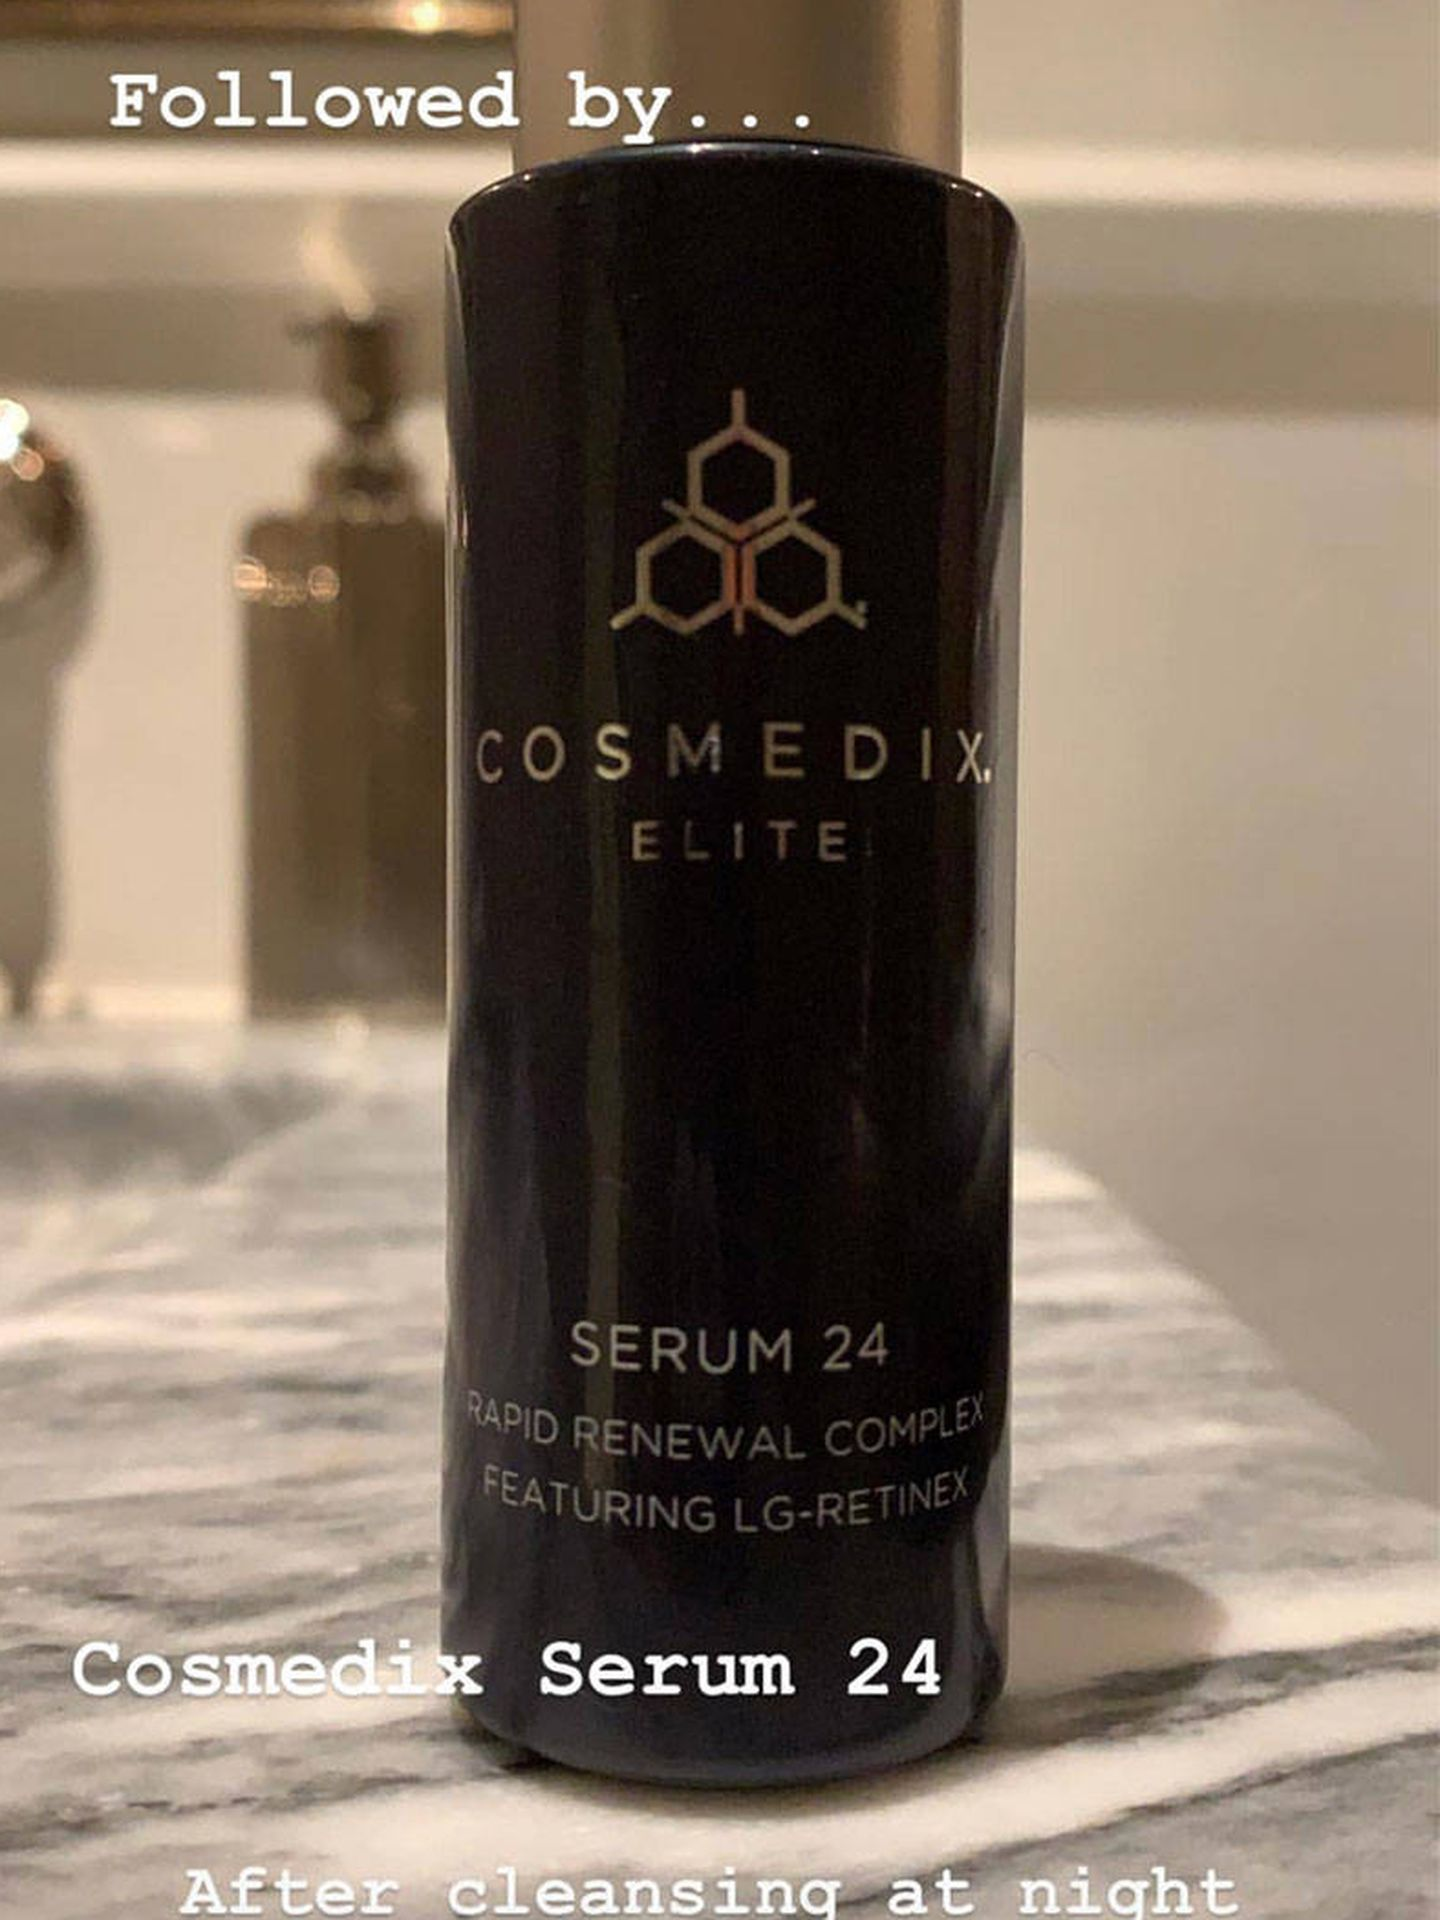 Serum 24 Cosmedix.